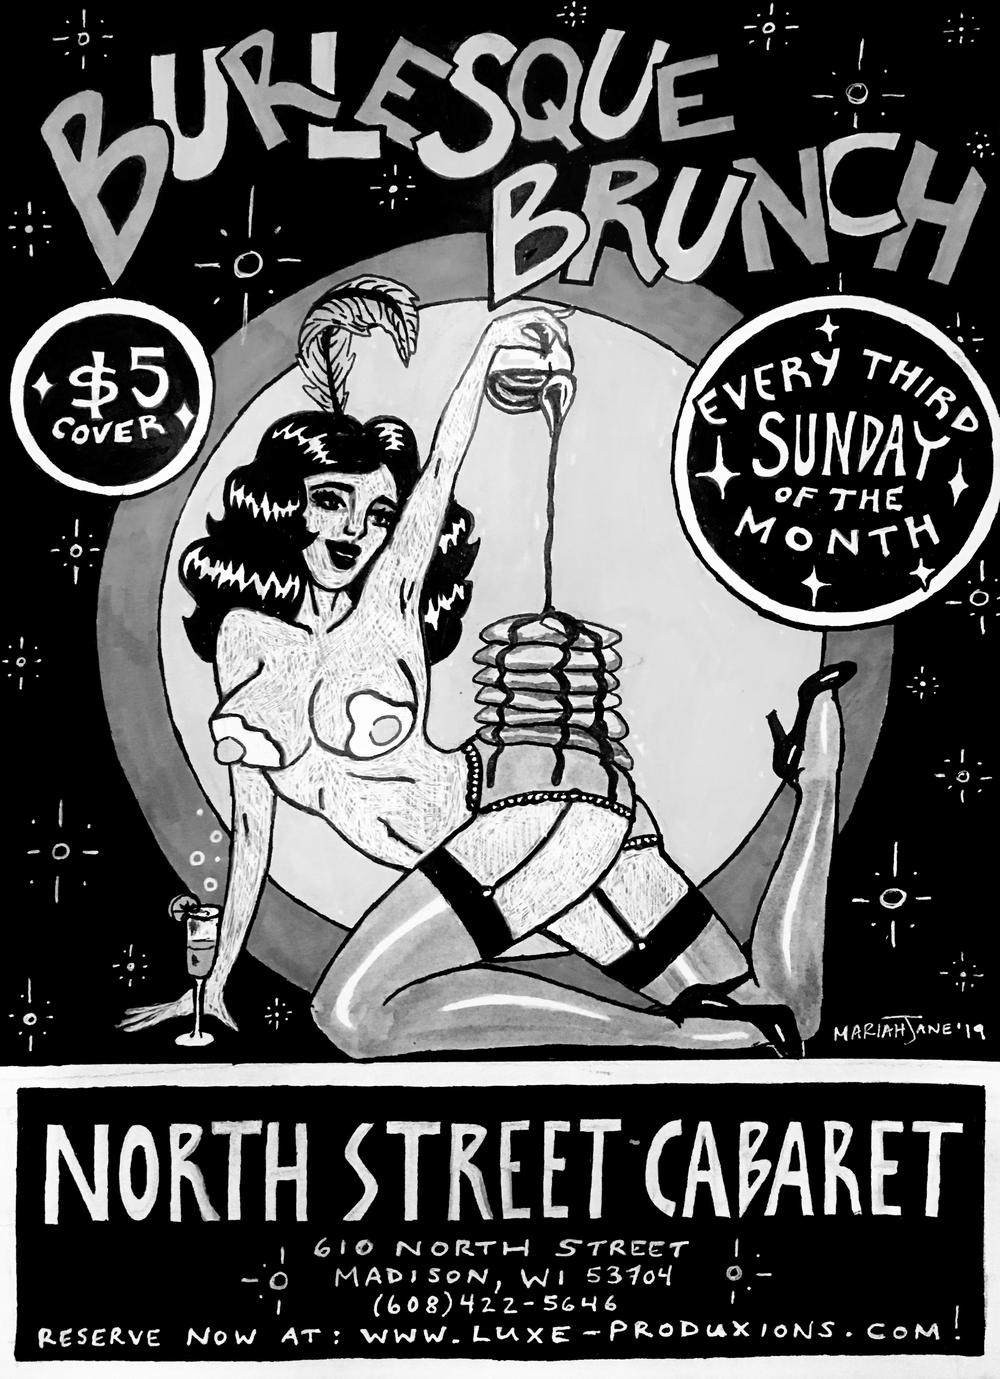 events — the north street cabaret